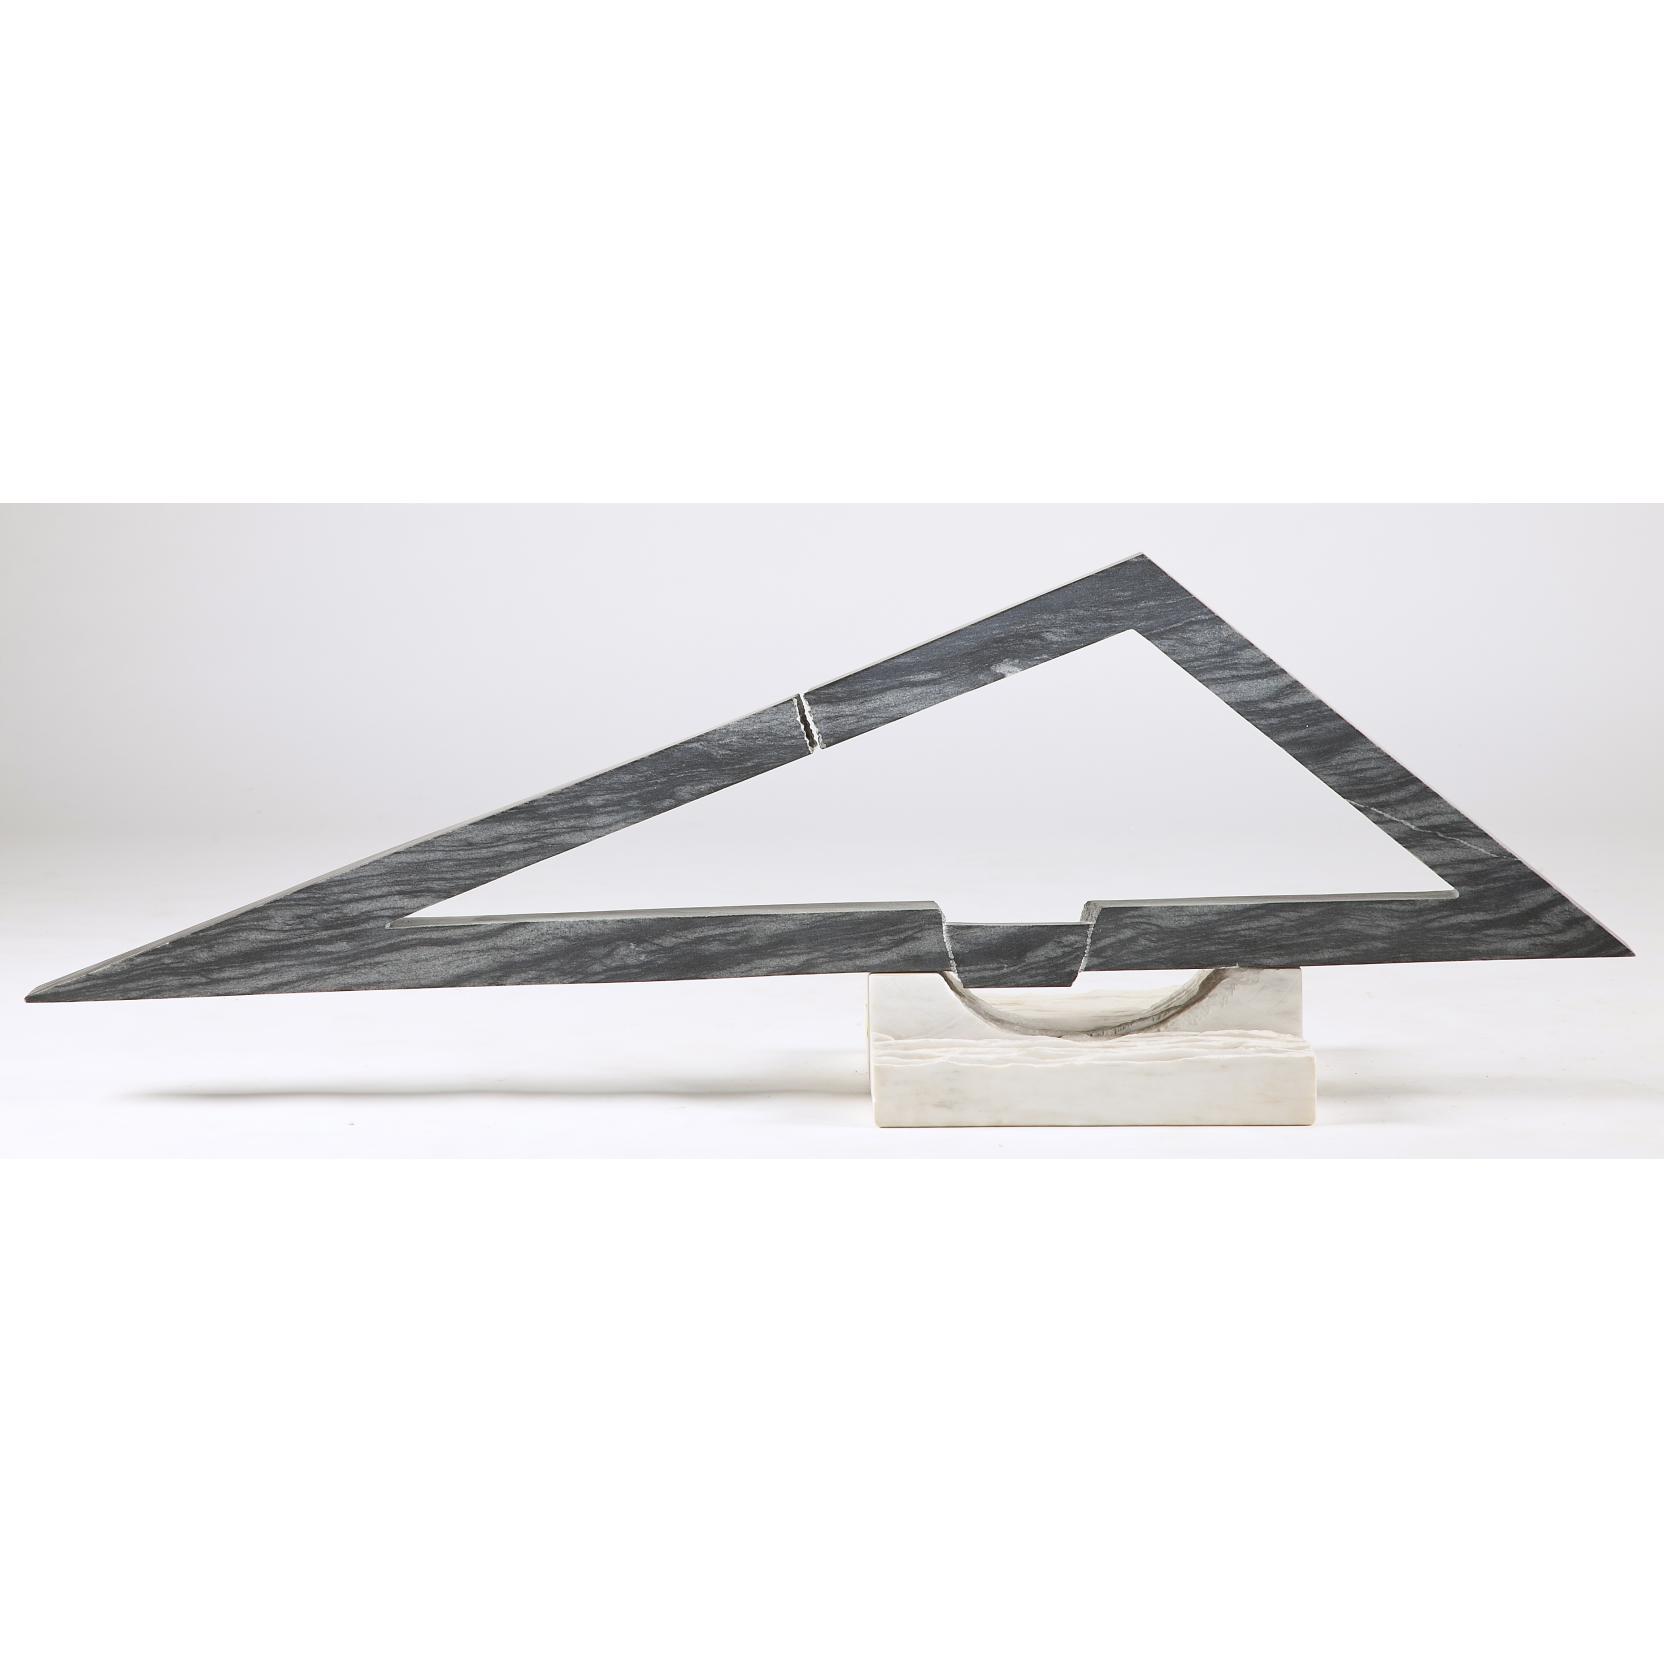 be-gardiner-nc-geometric-stone-sculpture